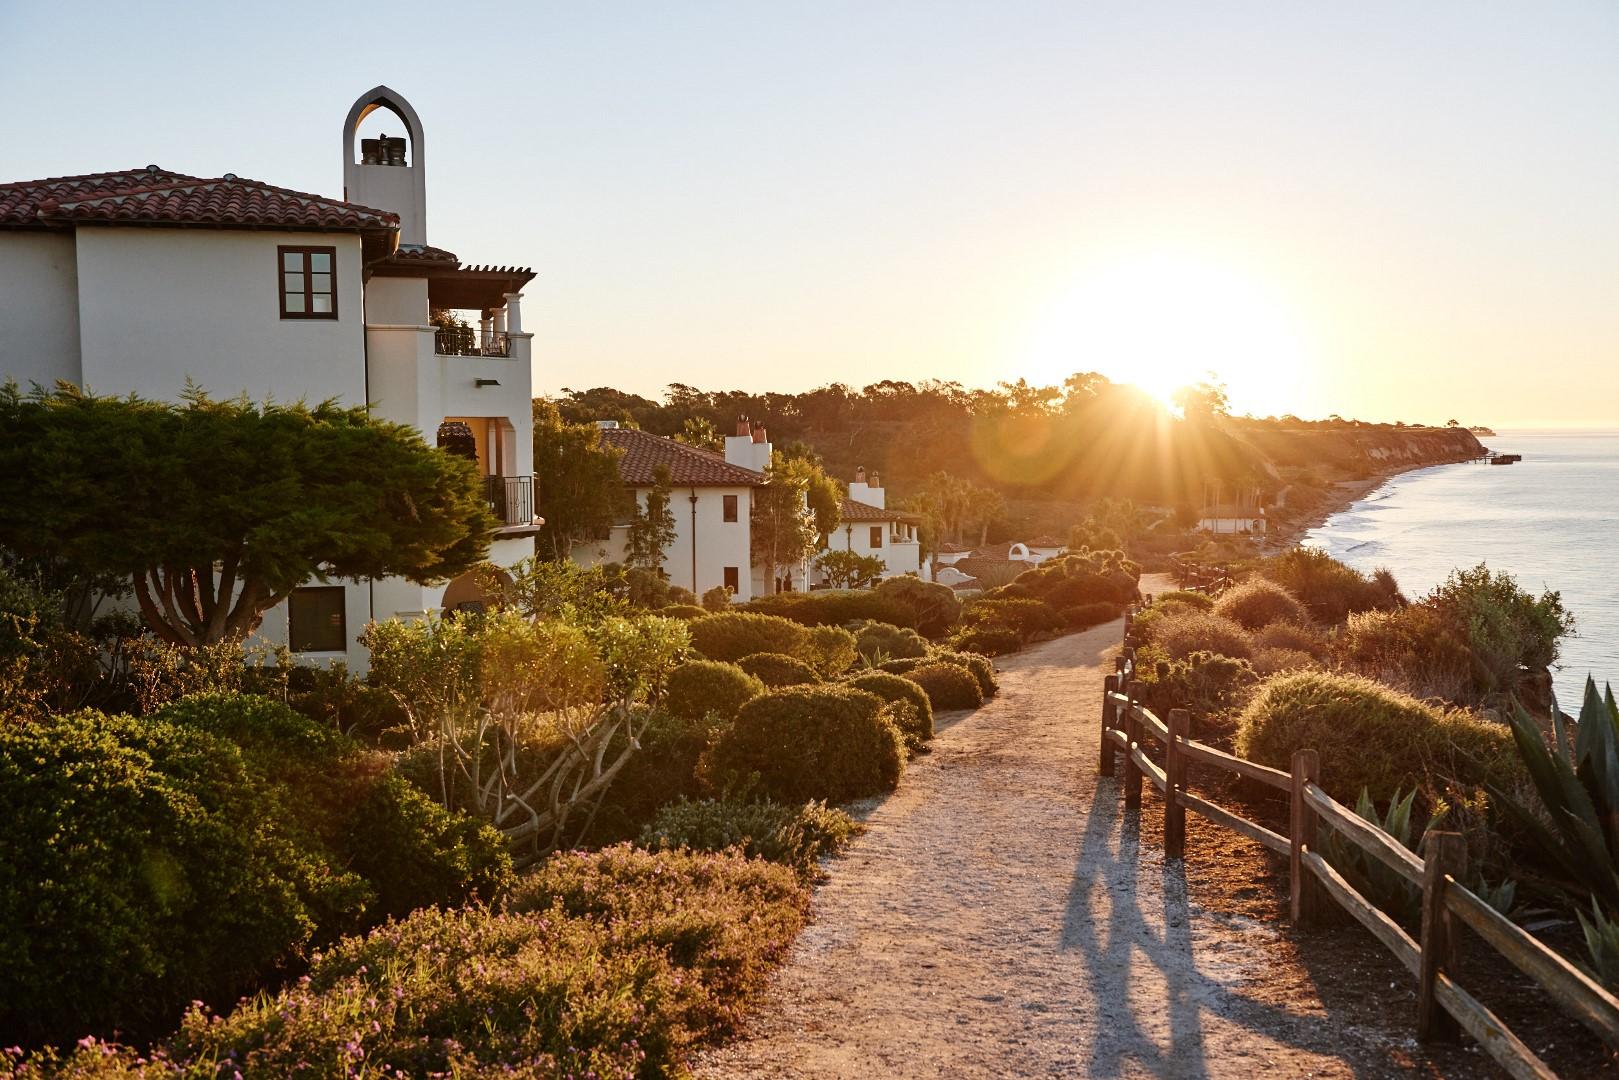 Iconic Oceanfront Resort: The Ritz-Carlton Bacara, Santa Barbara